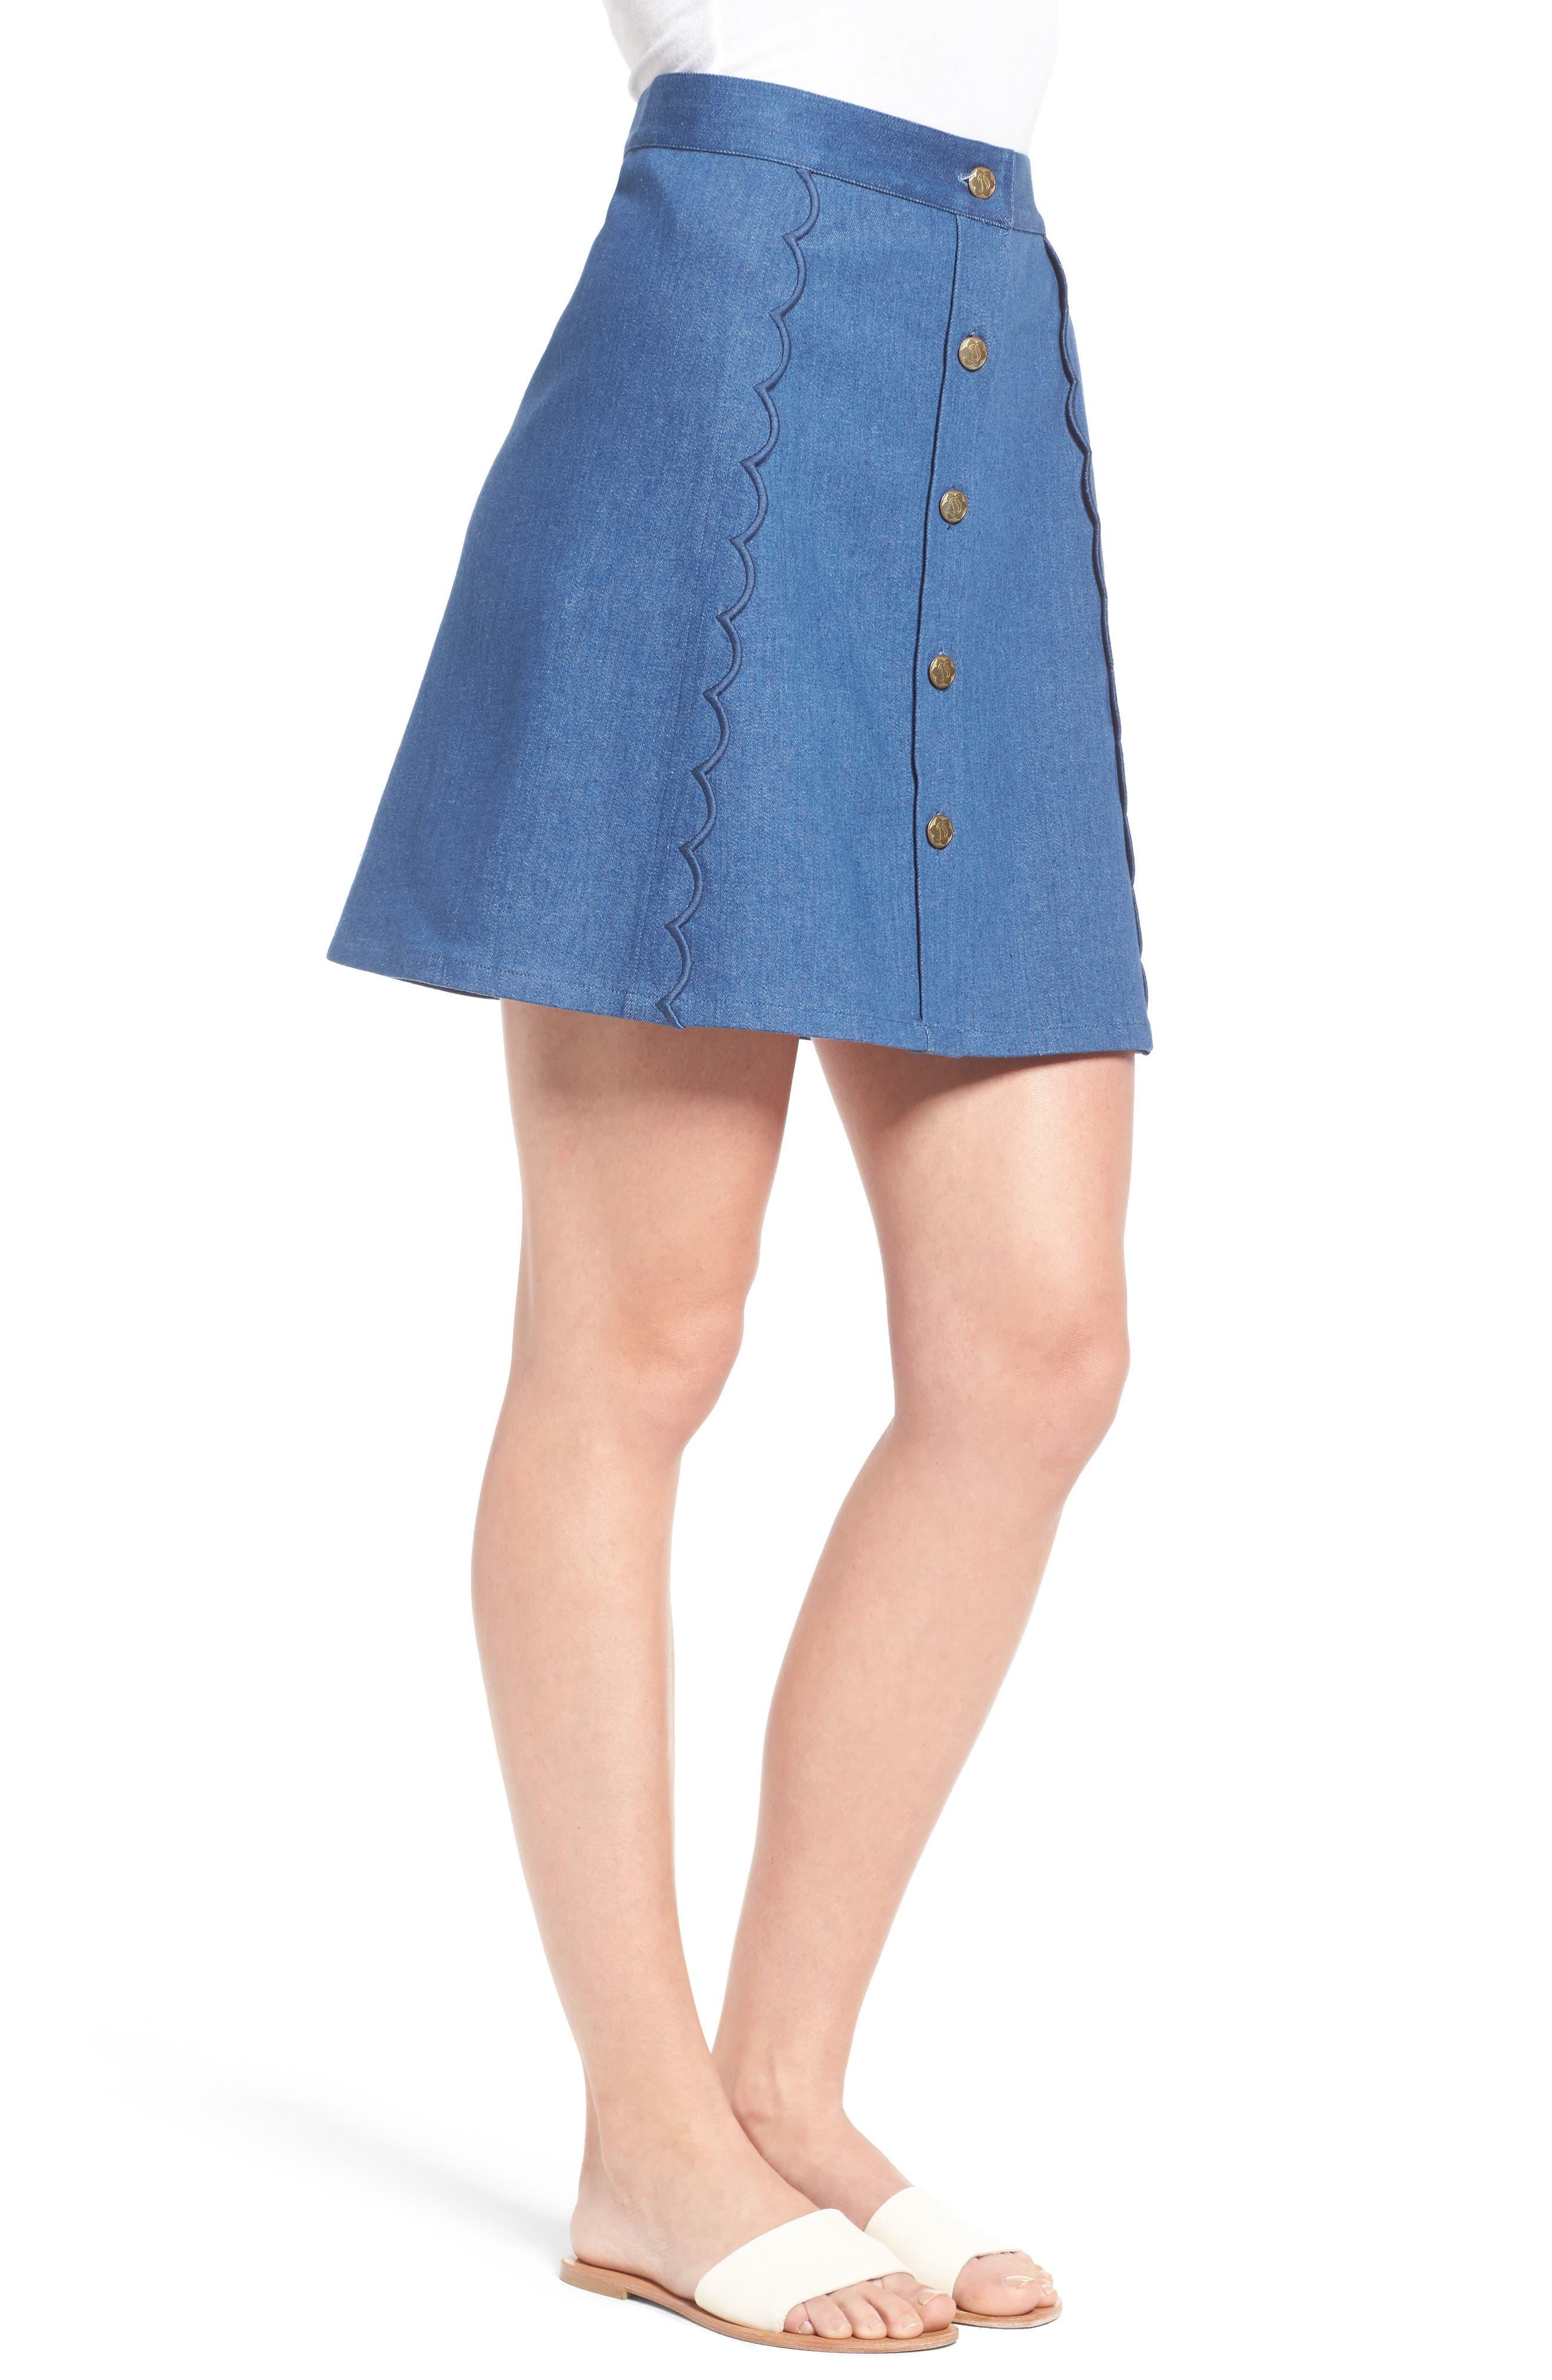 Alternate Image 3  - Draper James Stretch Denim Miniskirt (Nordstrom Exclusive)